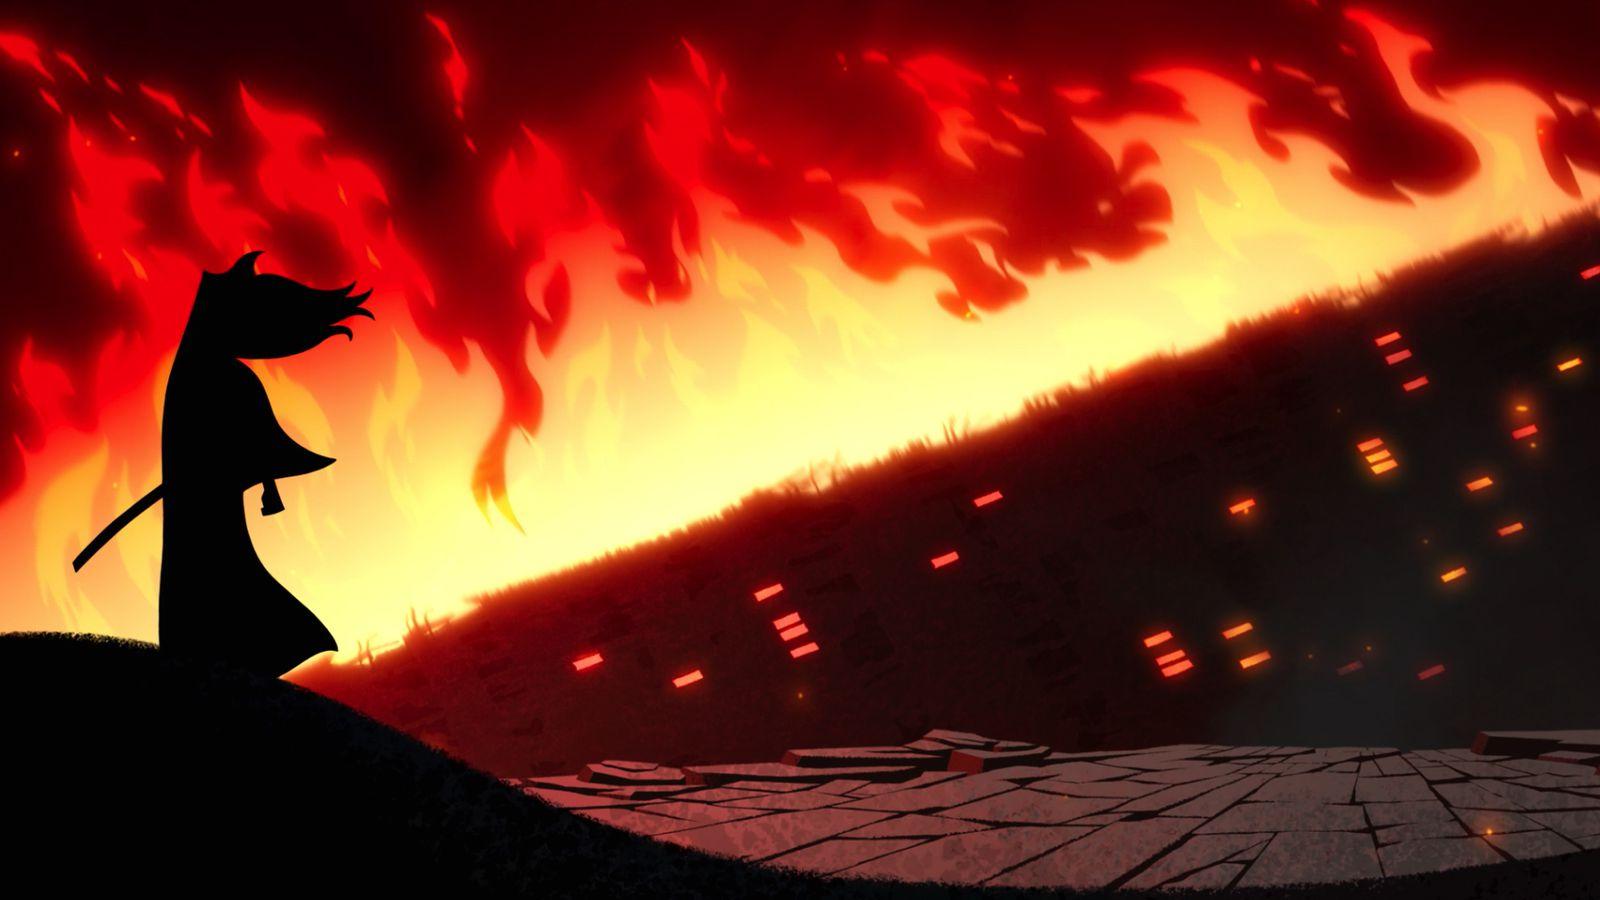 Dark Souls Animated Wallpaper Samurai Jack The Essential Episodes Polygon